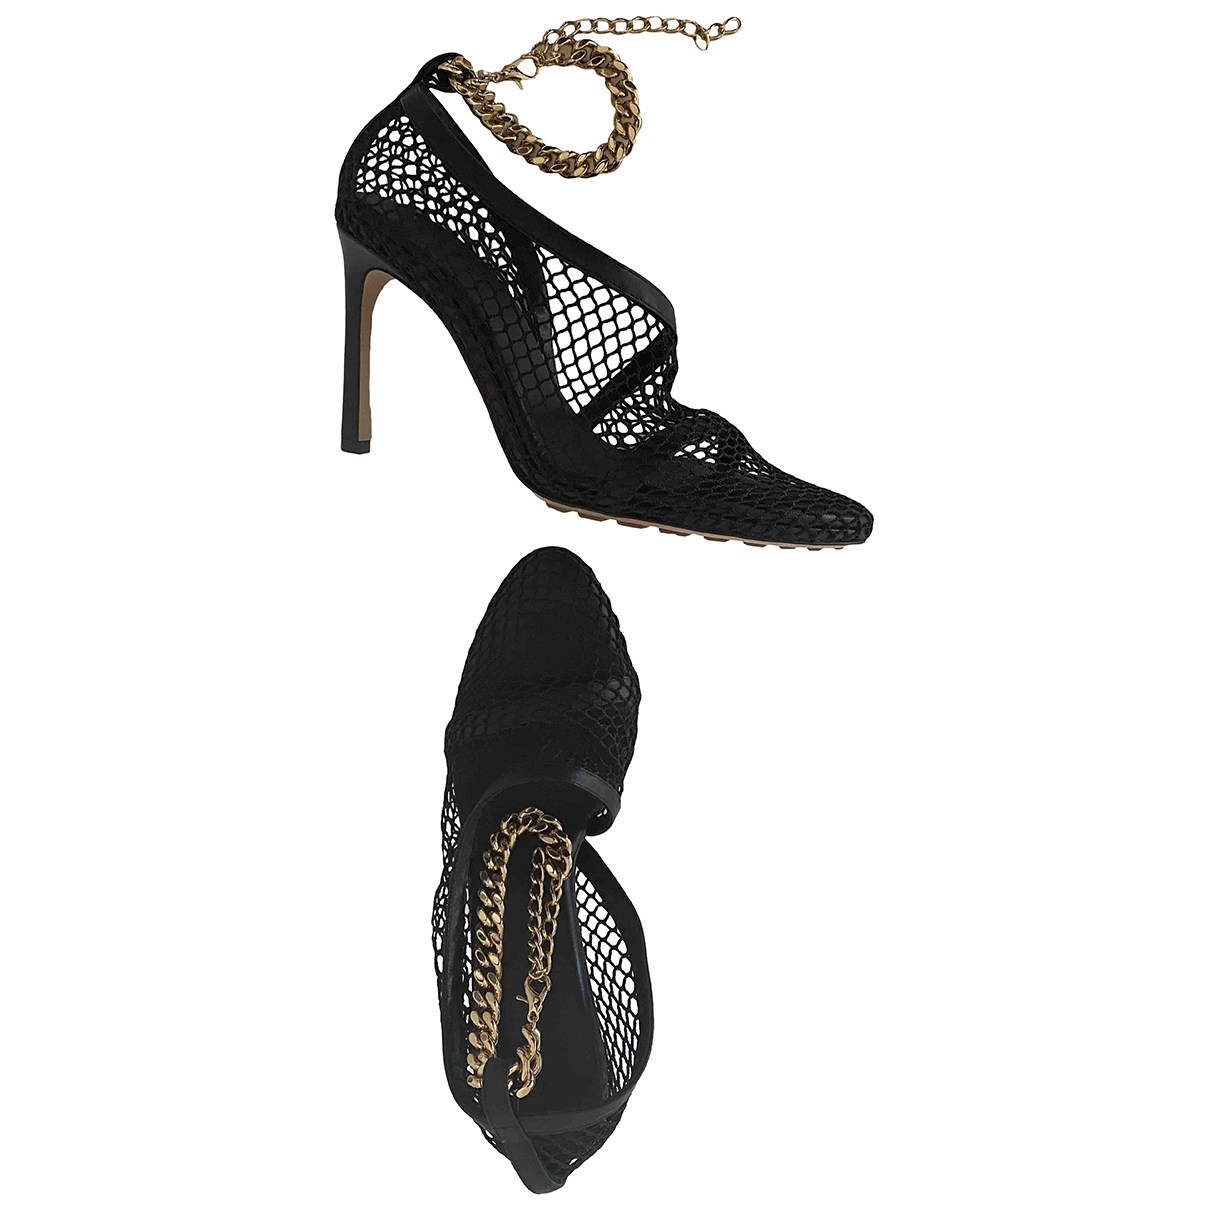 Bottega Veneta - Escarpins   pour femme en toile - noir